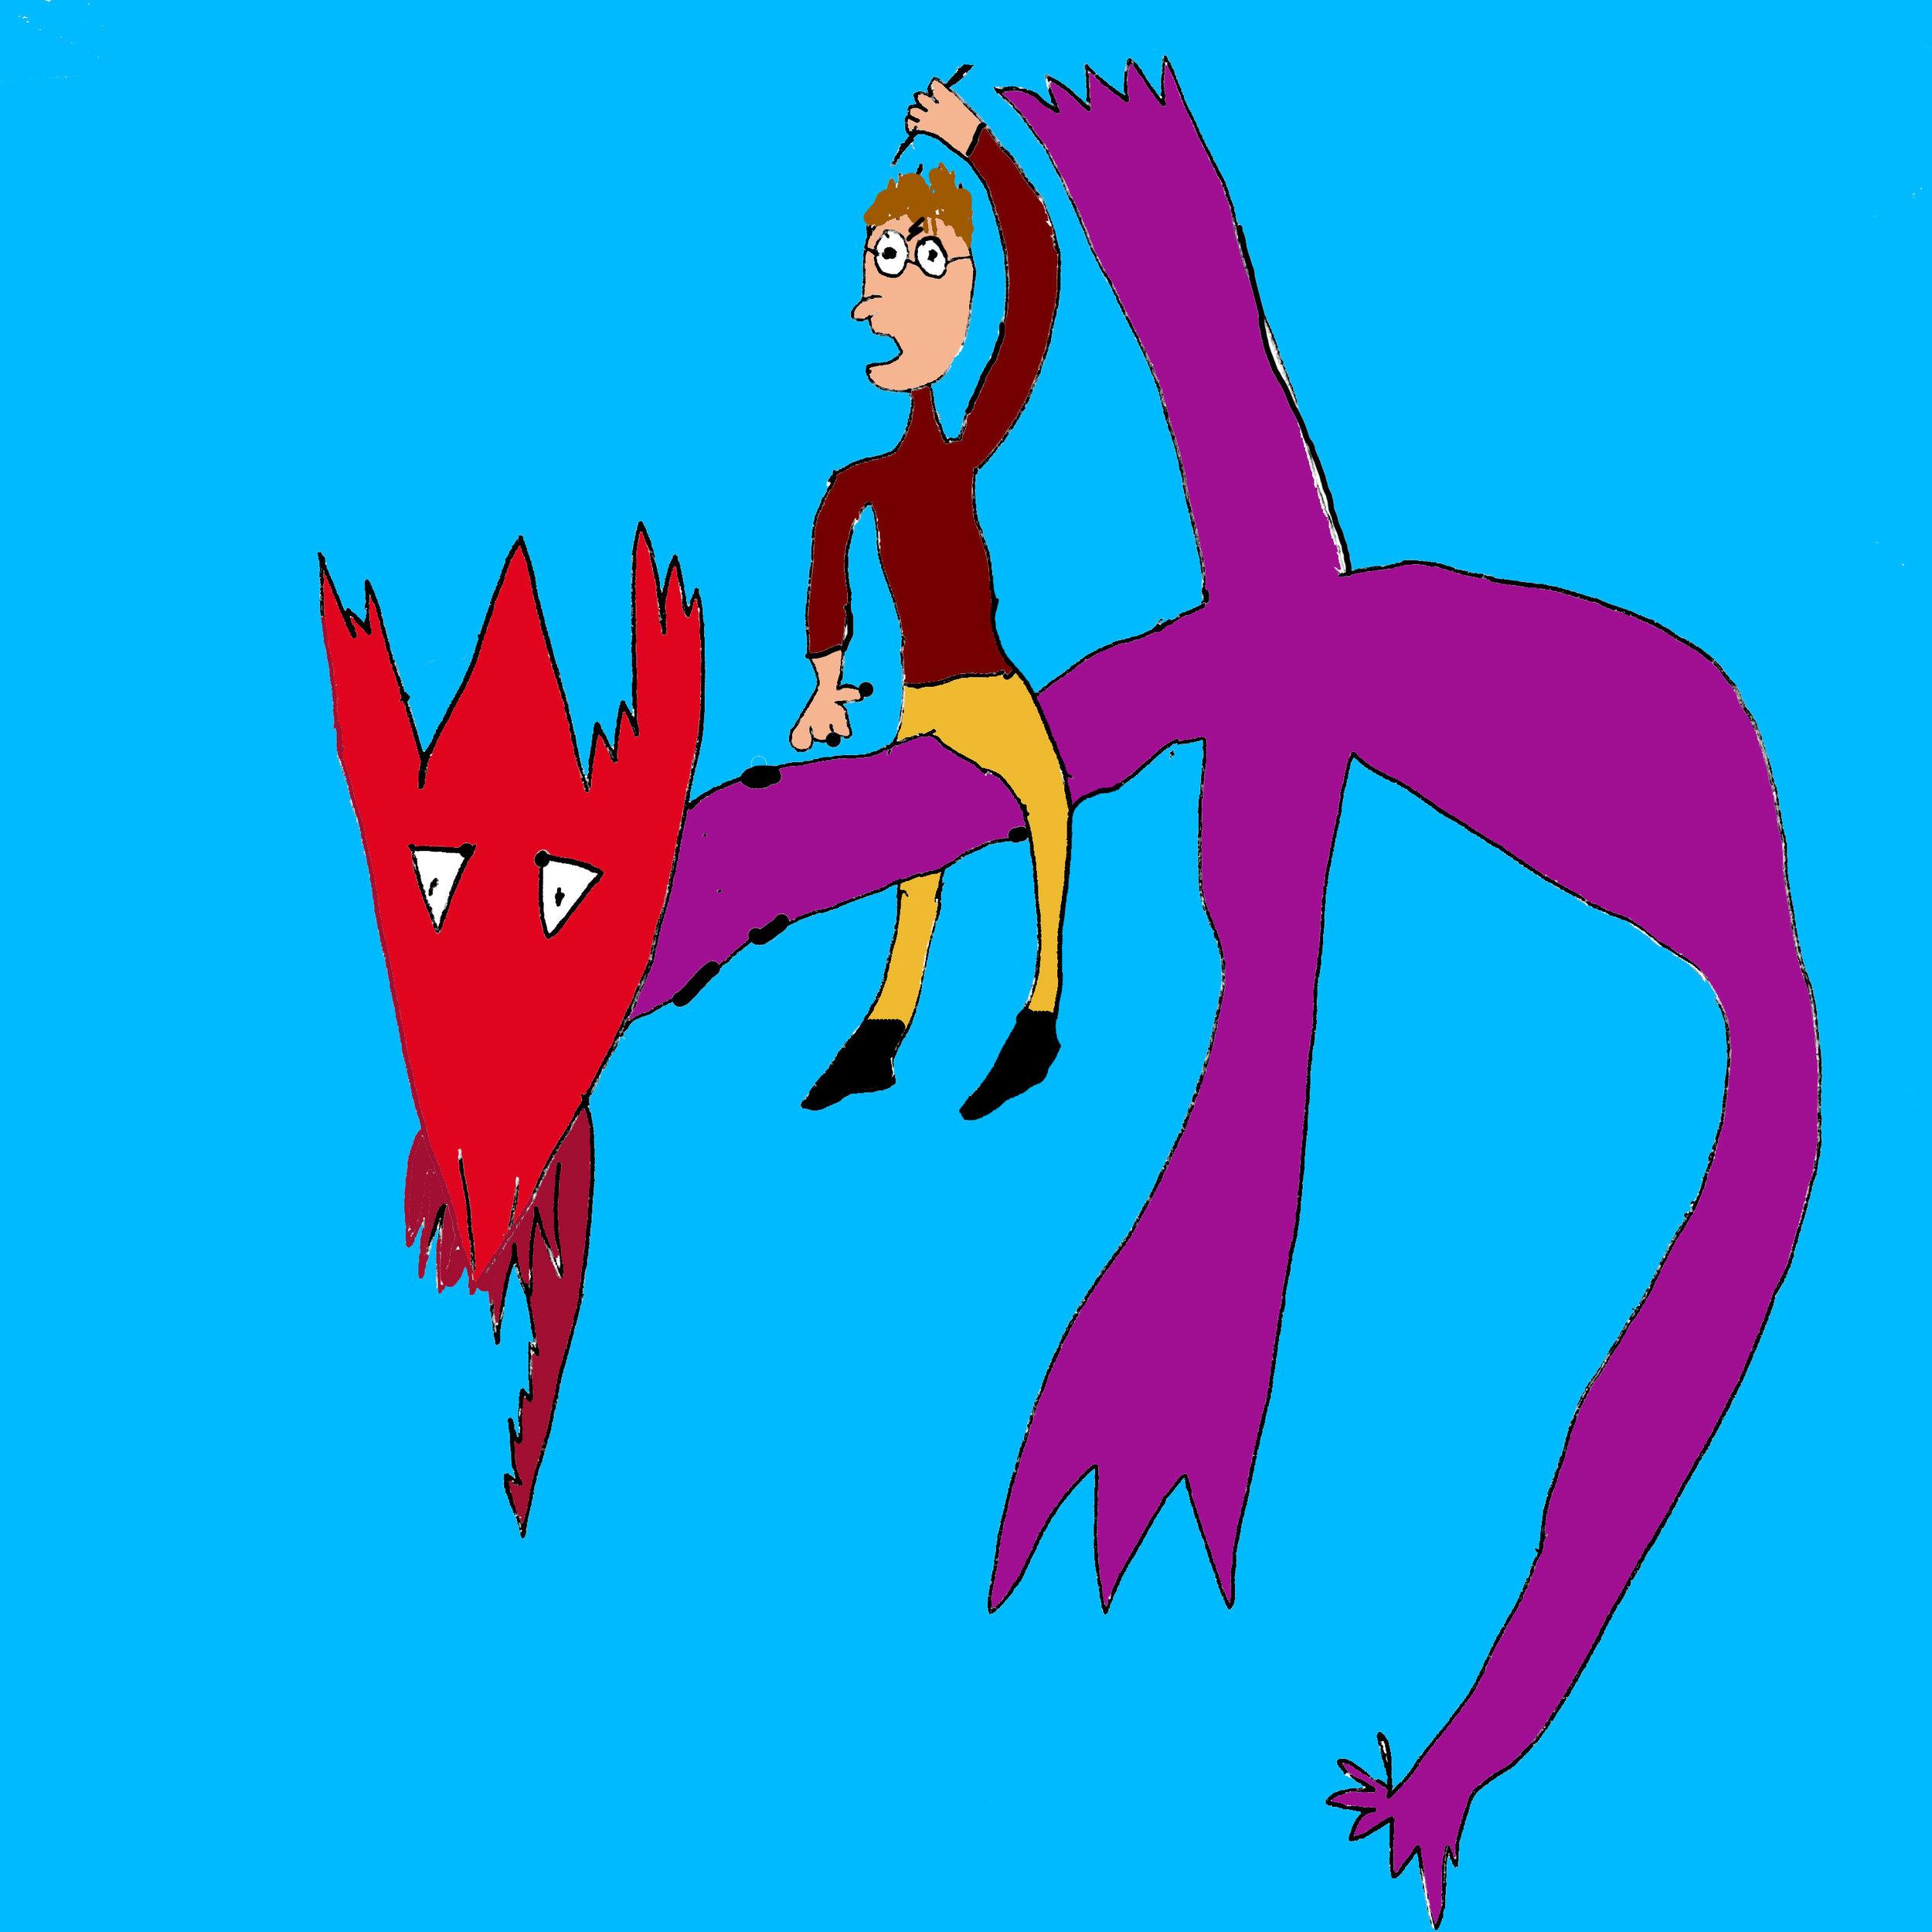 Harry Potter riding a Hungarian Horntail dragon facing forward